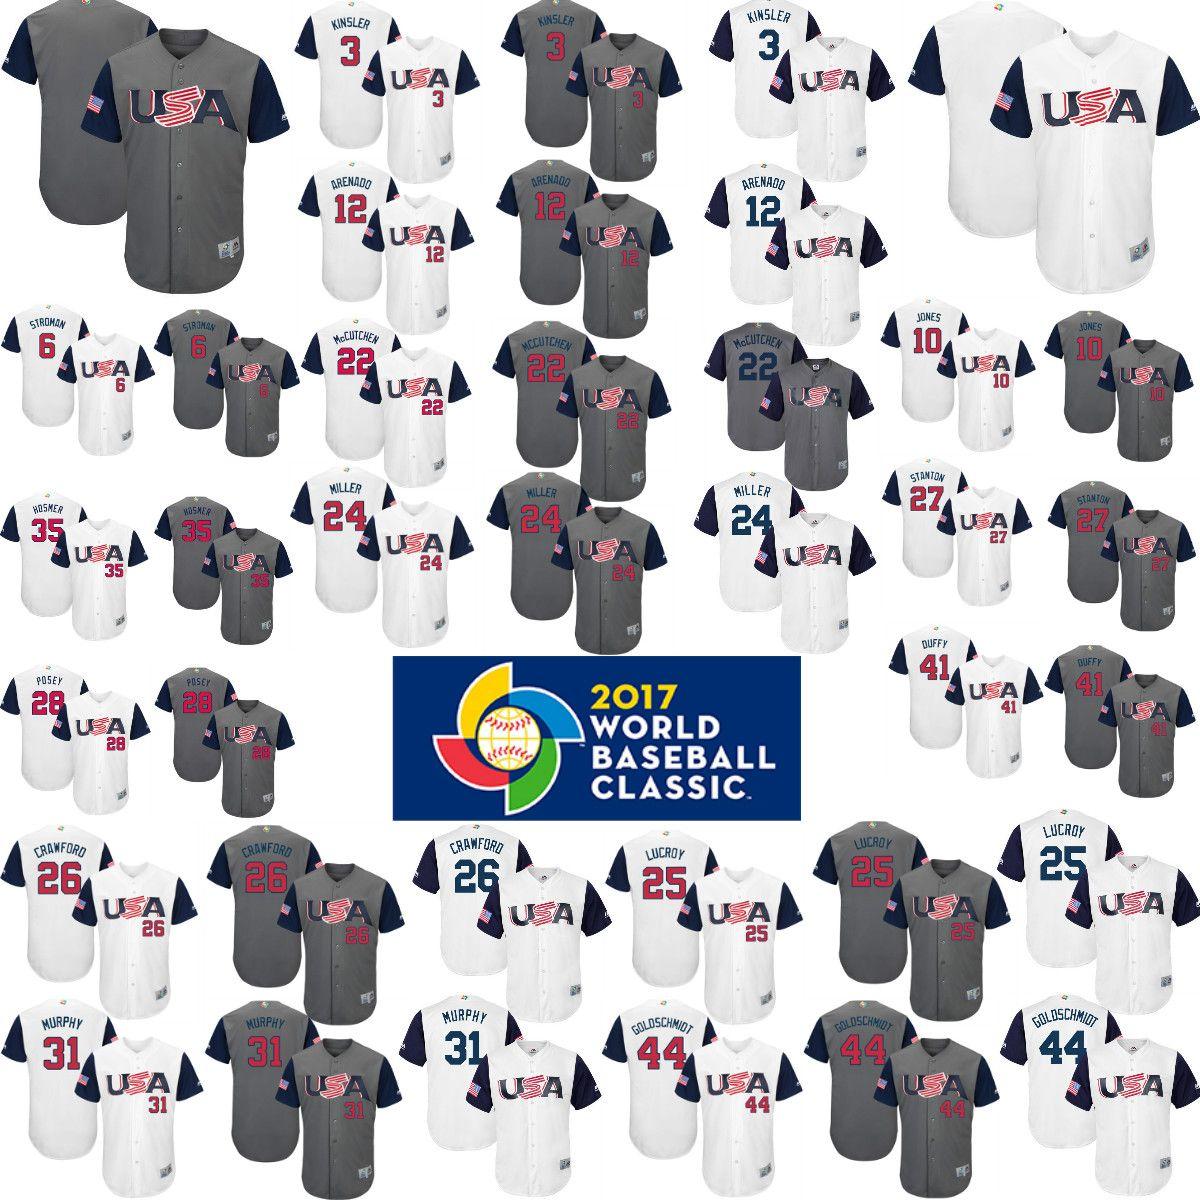 f510013beb0 ... 35 Eric Hosmer 22 Andrew McCutchen Jersey 2017 2017 USA World Baseball  Classic Jerseys 10 Adam Jones 12 Nolan Arenado 27 Giancarlo Stanton 28 ...